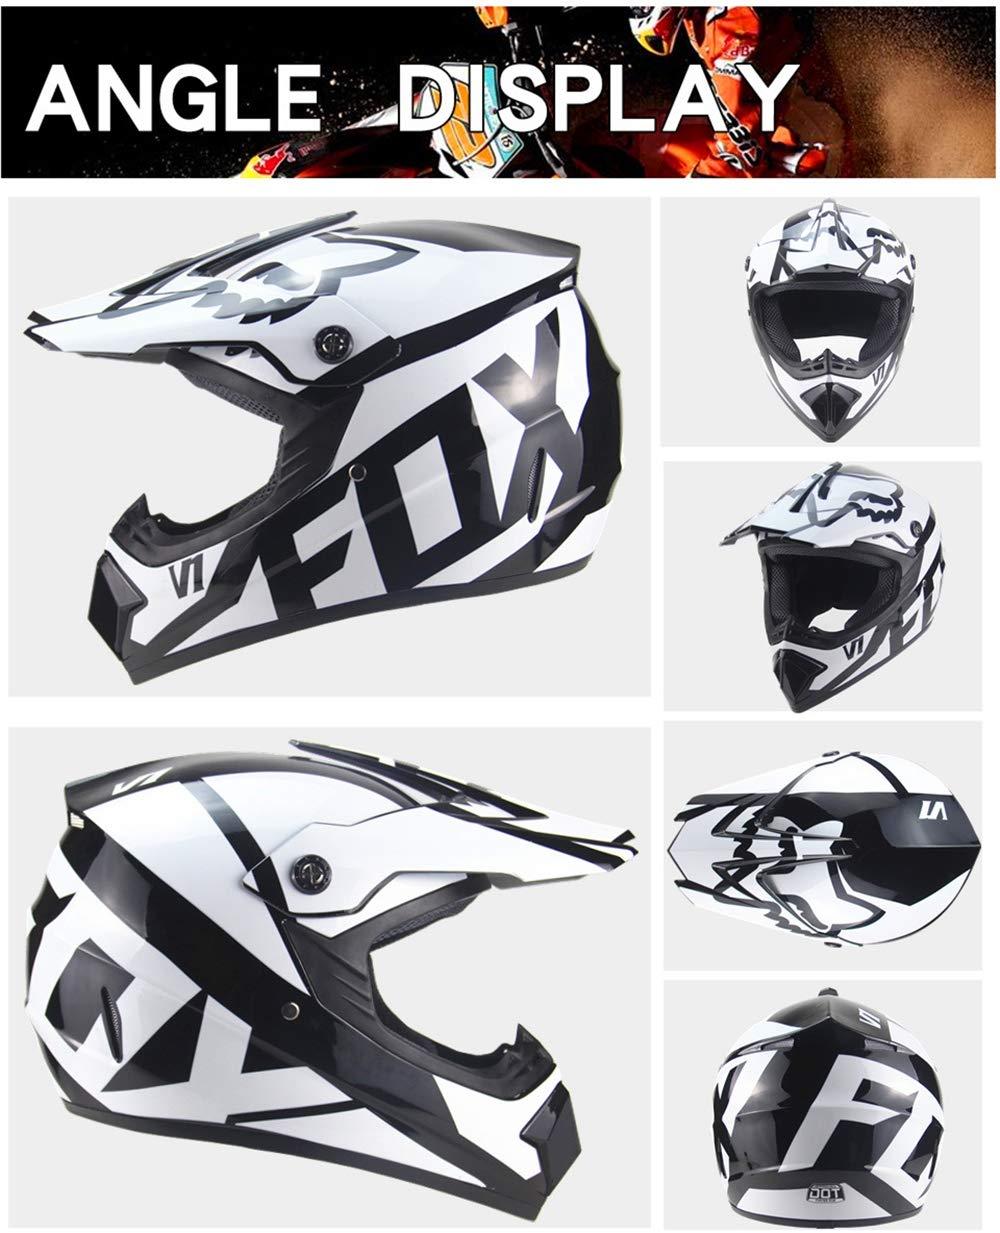 Mujeres M-GLT Motocross Adulto Crash Helmet para Hombres Motocicletas DH Off-Road Enduro ATV BMX MTB Downhill Dirt Bikes Quad Moto Cross Country Casco con Gafas M/áscara